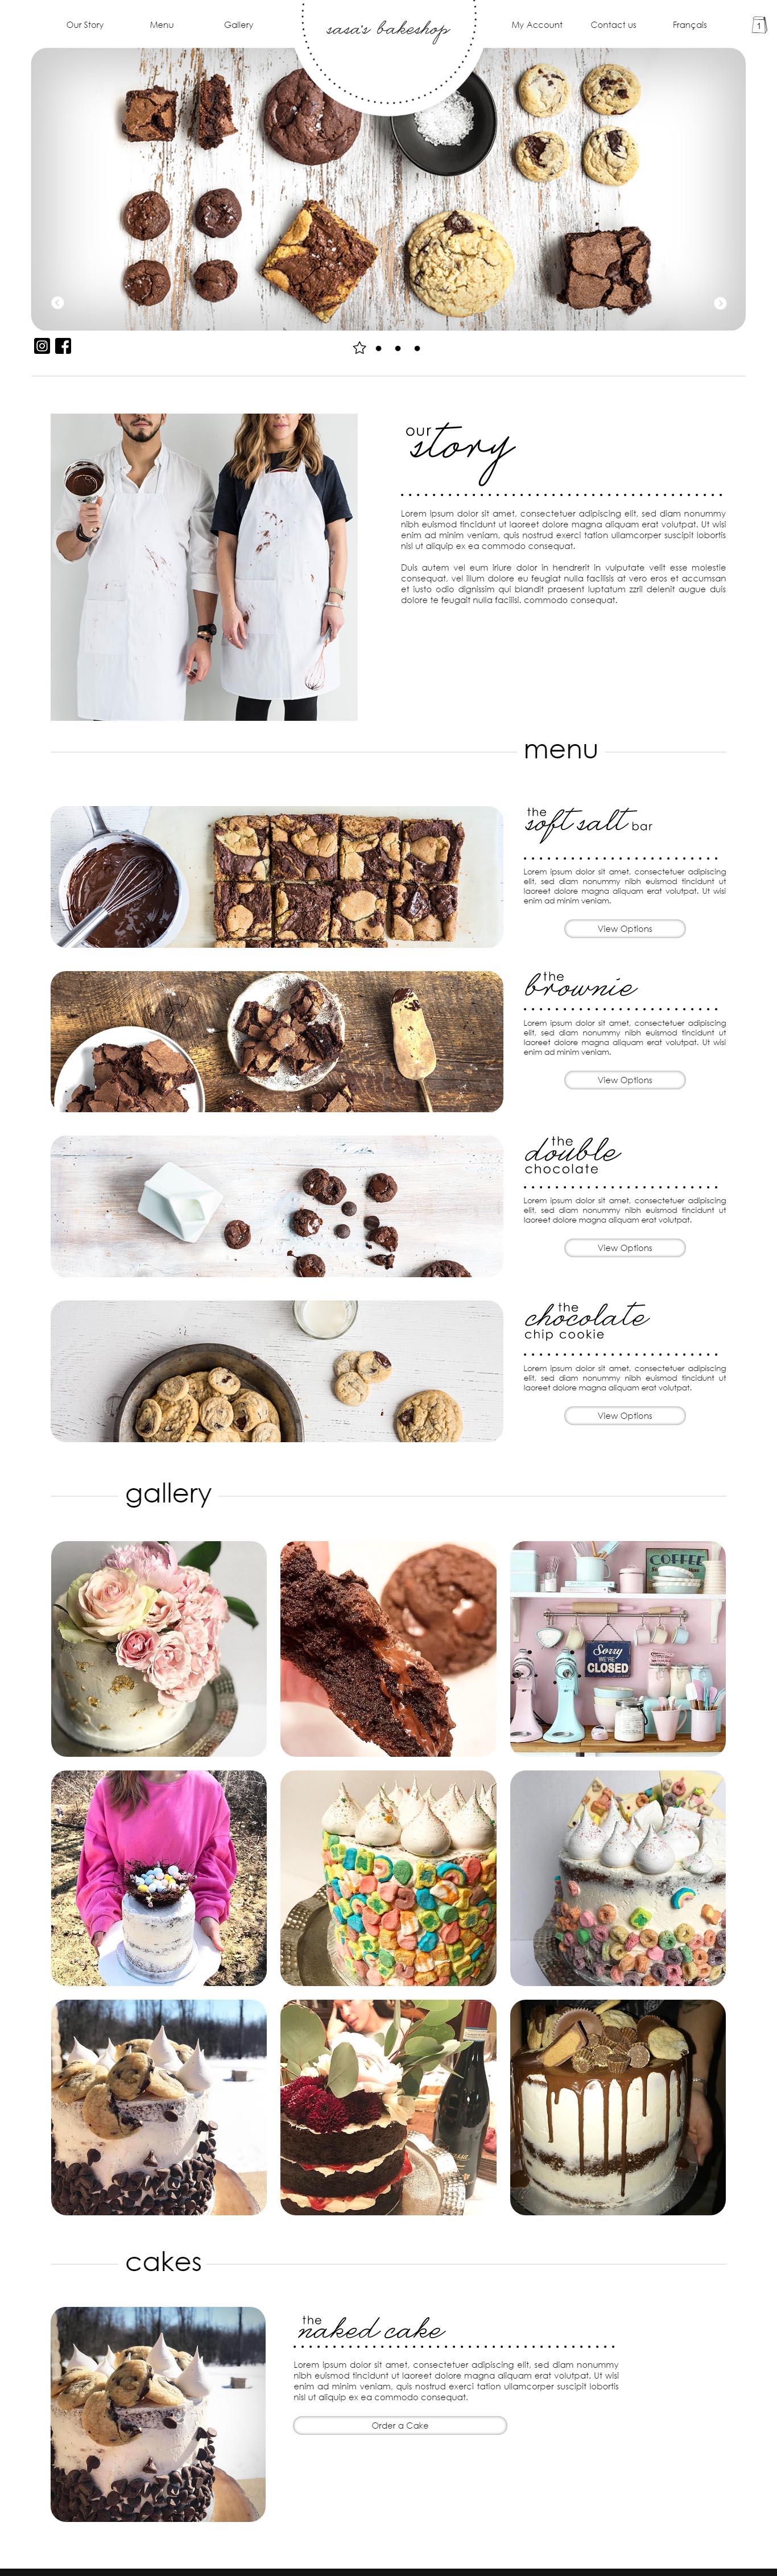 Sasa's Bakeshop Web Design Example